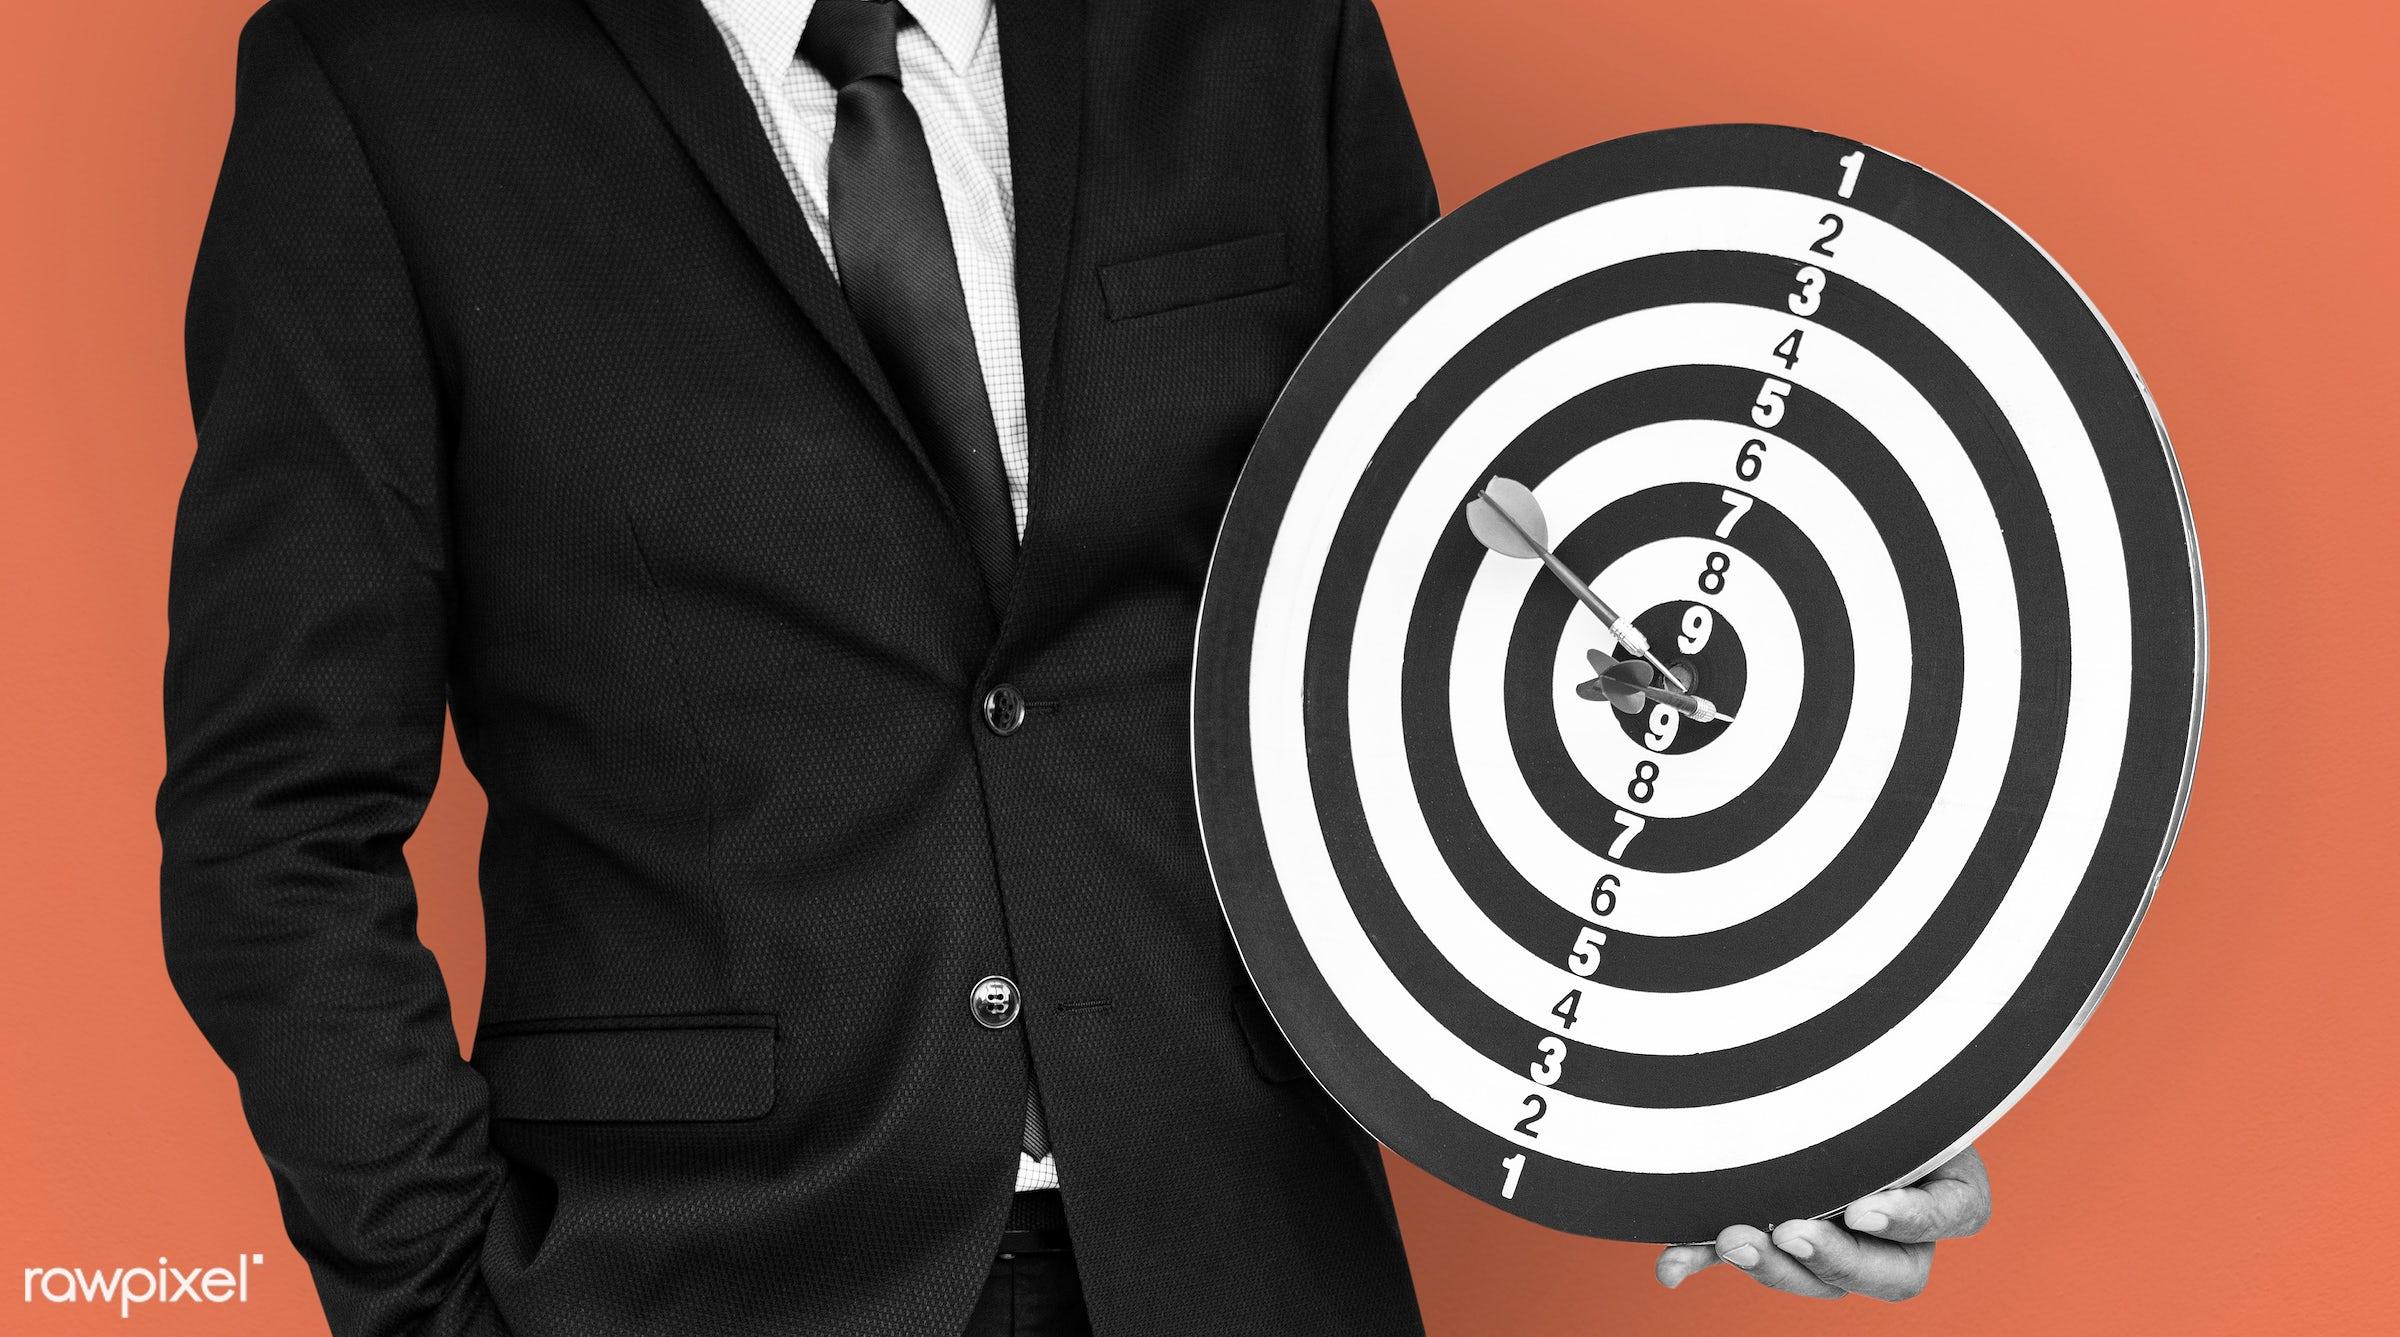 score, achieve, adult, background, bullseye, business dress, business wear, dart board, darts, expression, formal, formal...